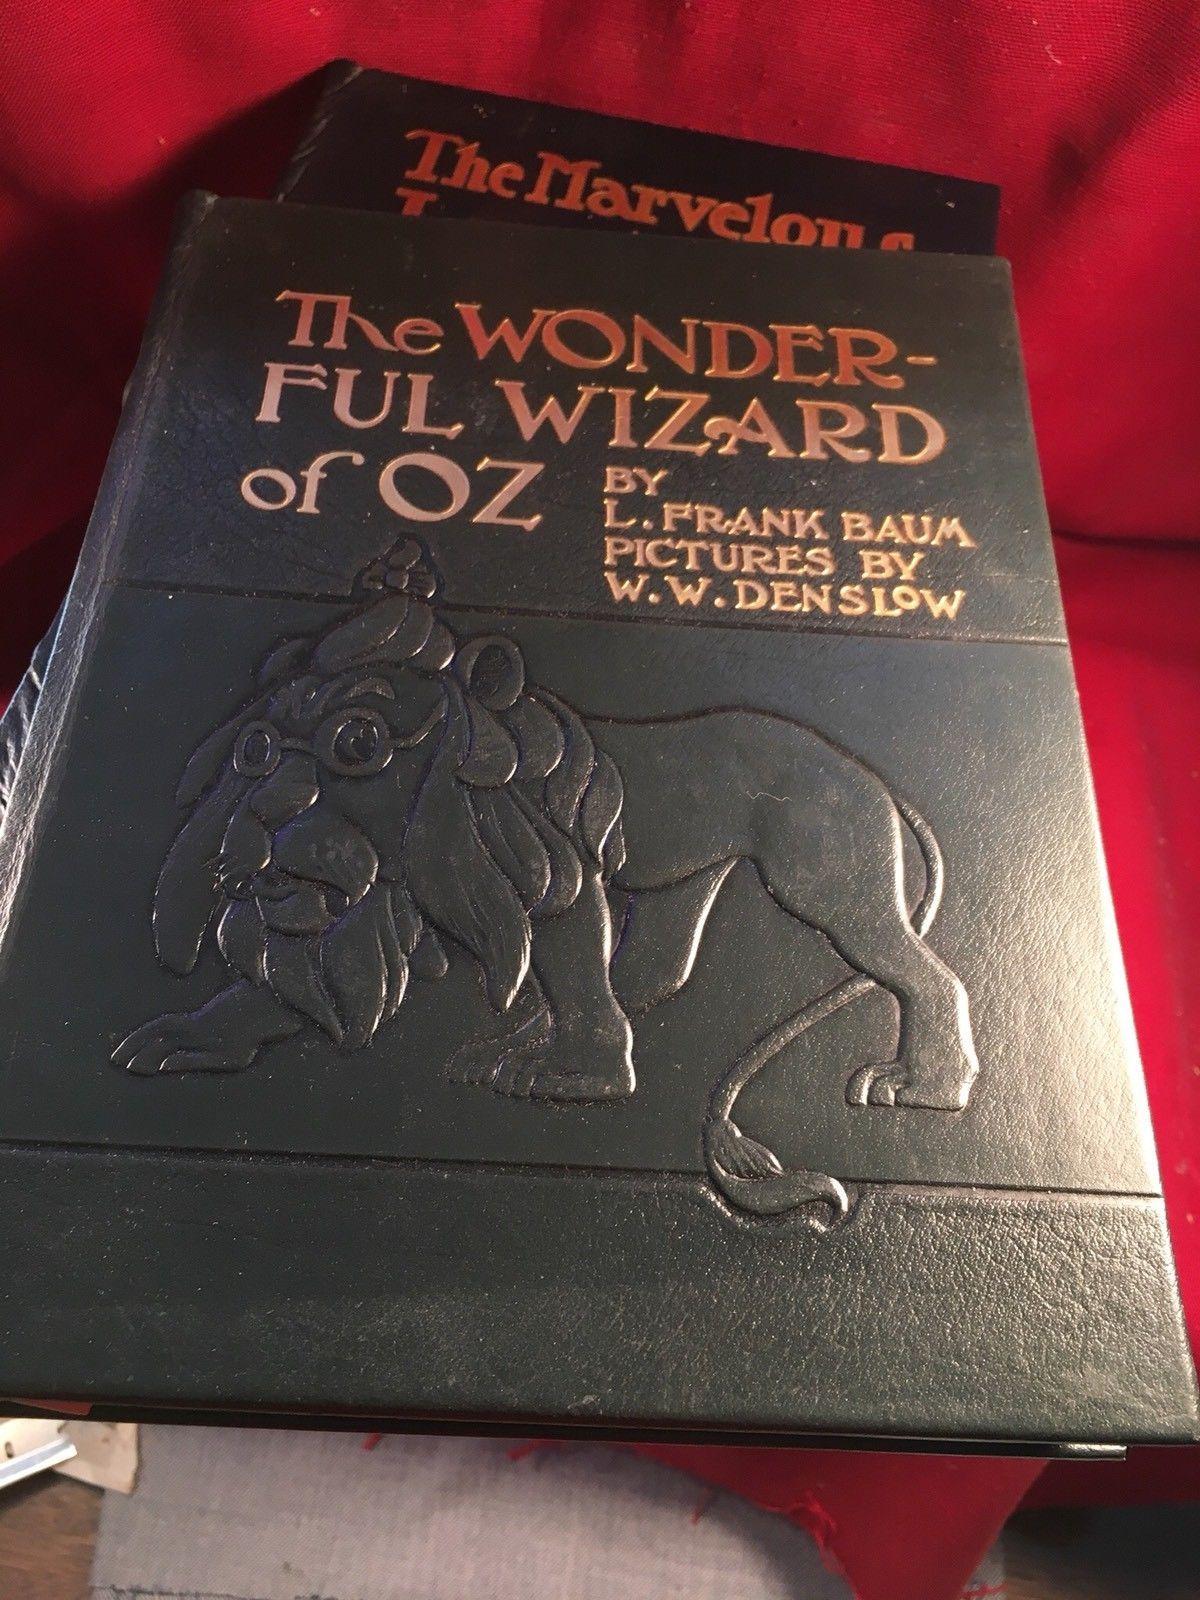 THE WONDERFUL WIZARD OF OZ - EASTON PRESS 1sts 6 Volume OZ - L. Frank Baum